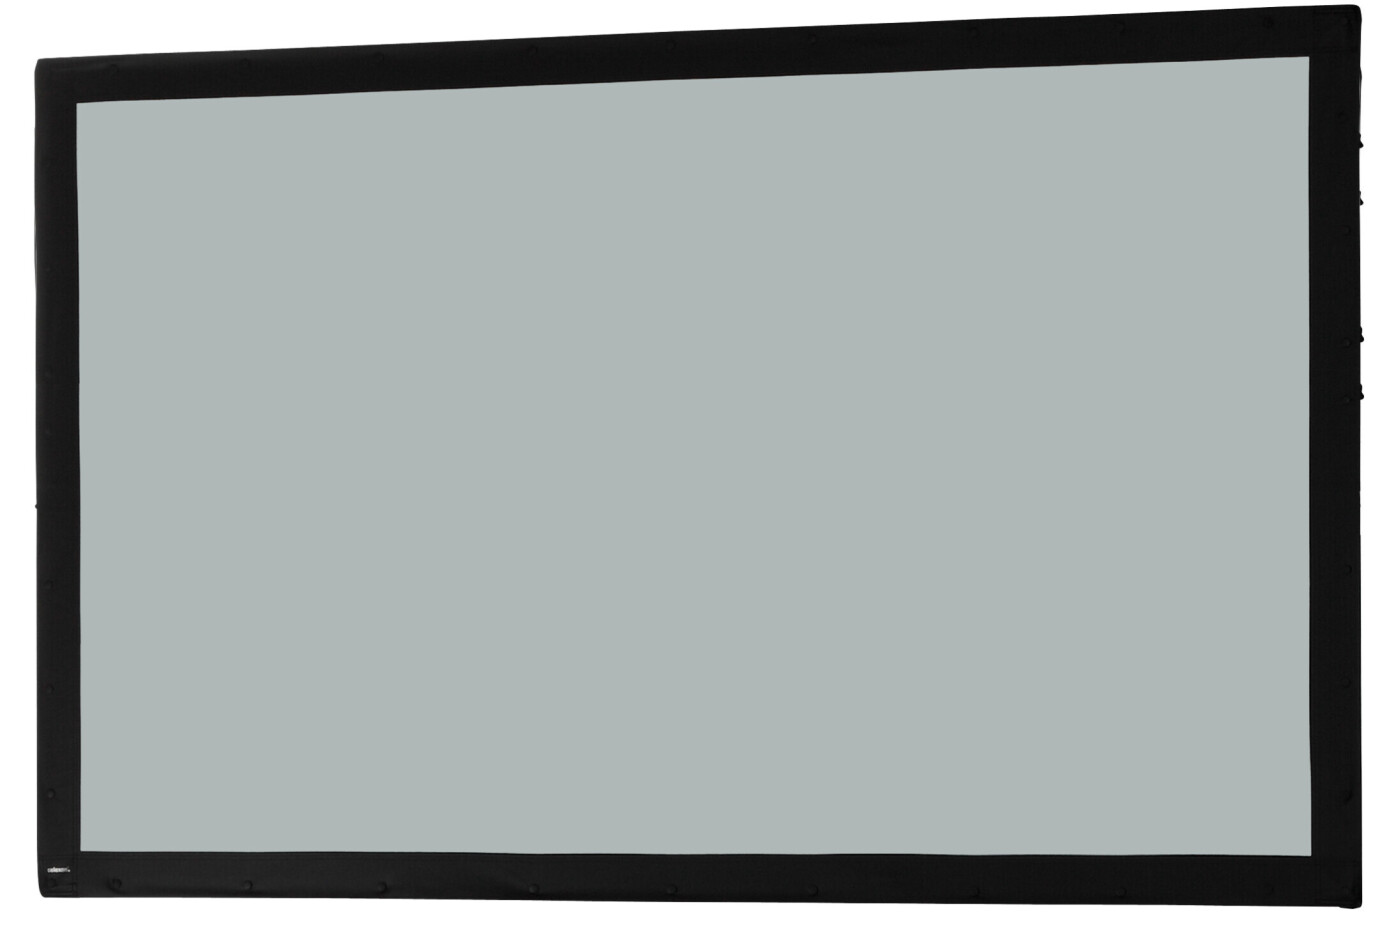 celexon Tuch für Faltrahmen Mobil Expert - 203 x 127 cm Rückprojektion